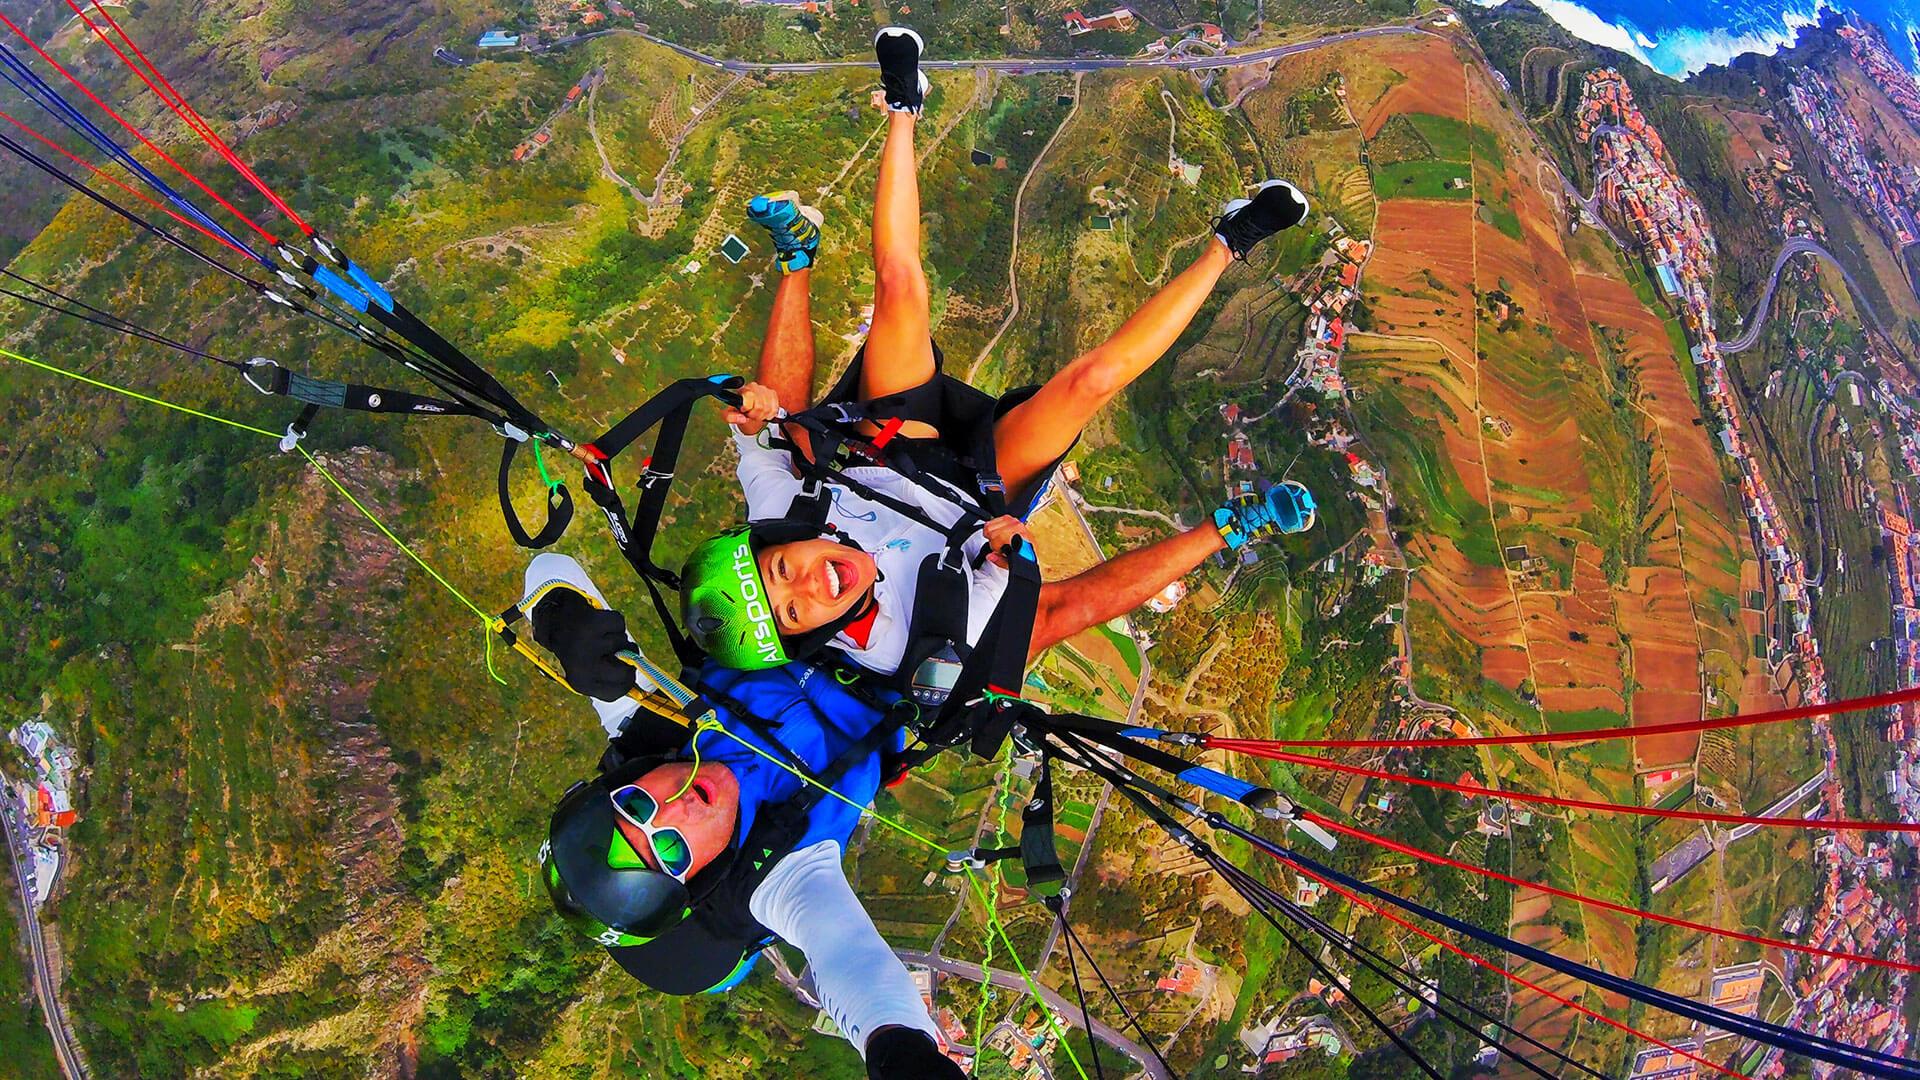 above perspective of tandem paragliders above green landscape